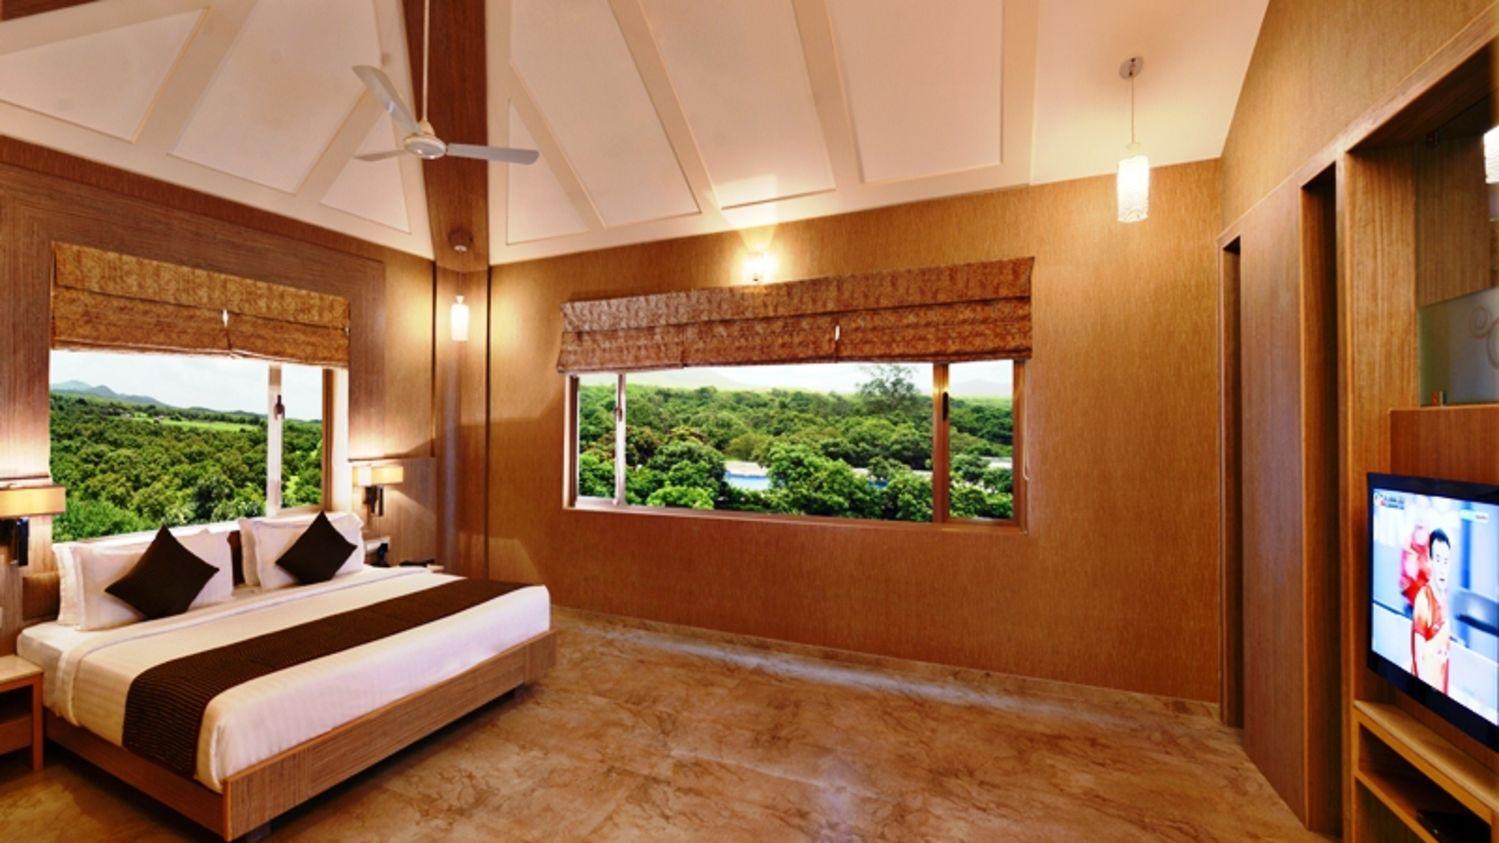 Rooms near Sasan Gir, Stay near Sasan Gir, Sarovar Portico, Sasan Gir